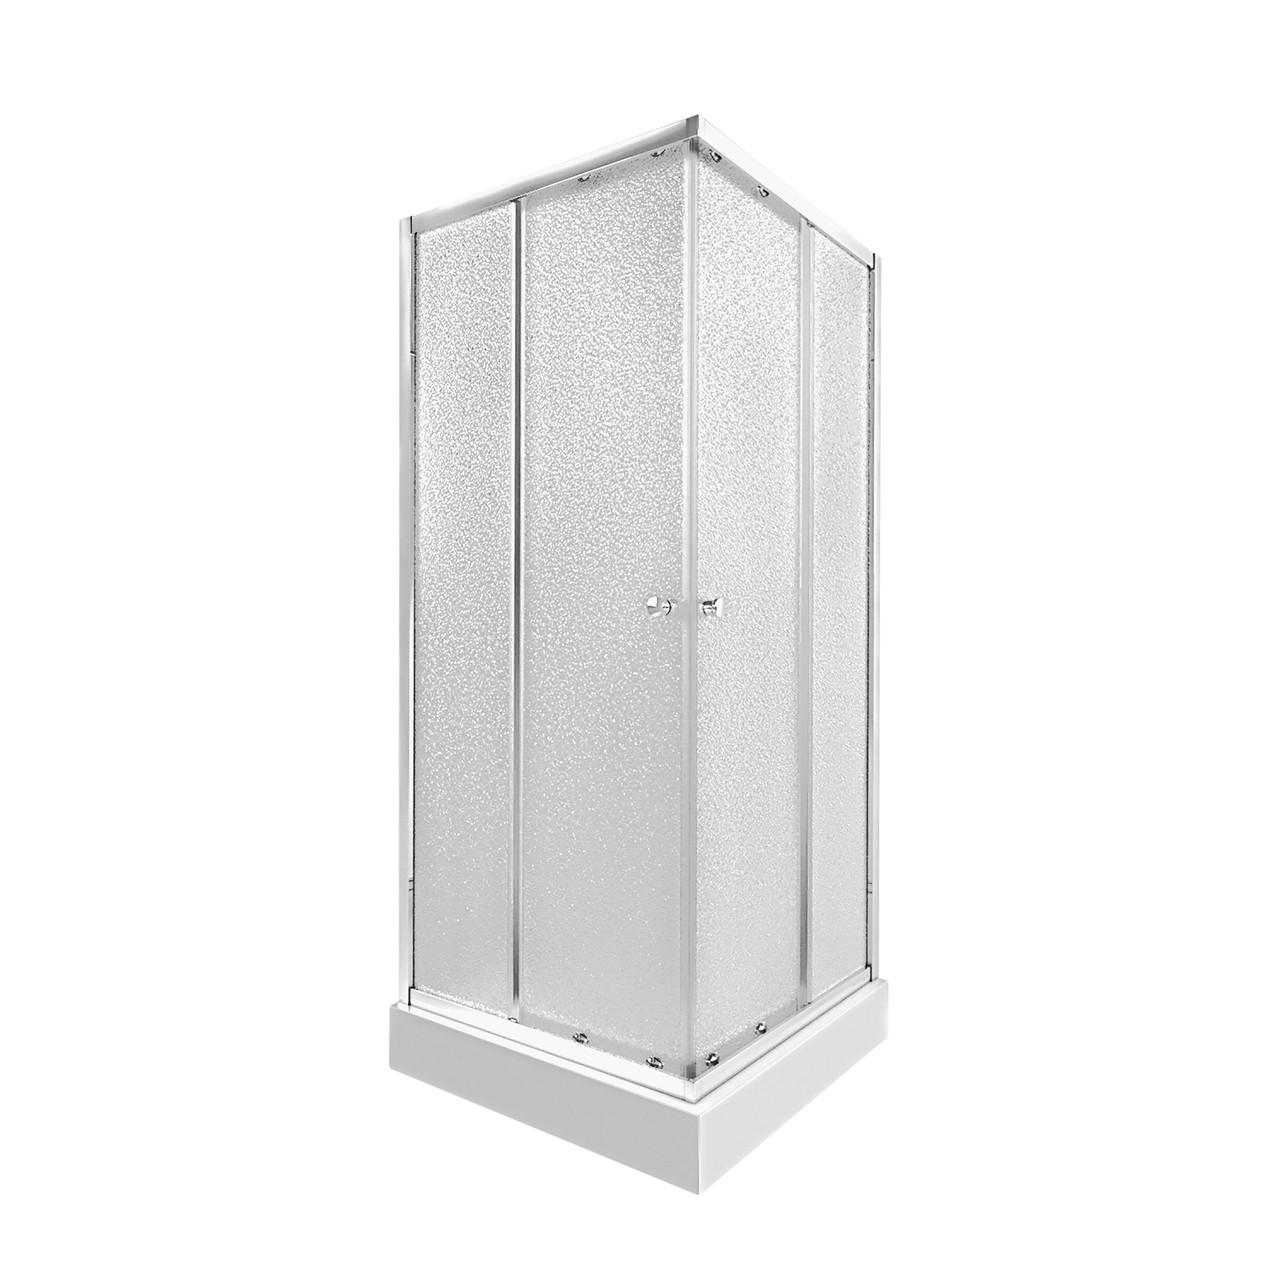 Набір Qtap душова кабіна Presto CRM1099SP5 Pear + піддон Unisquare 309915